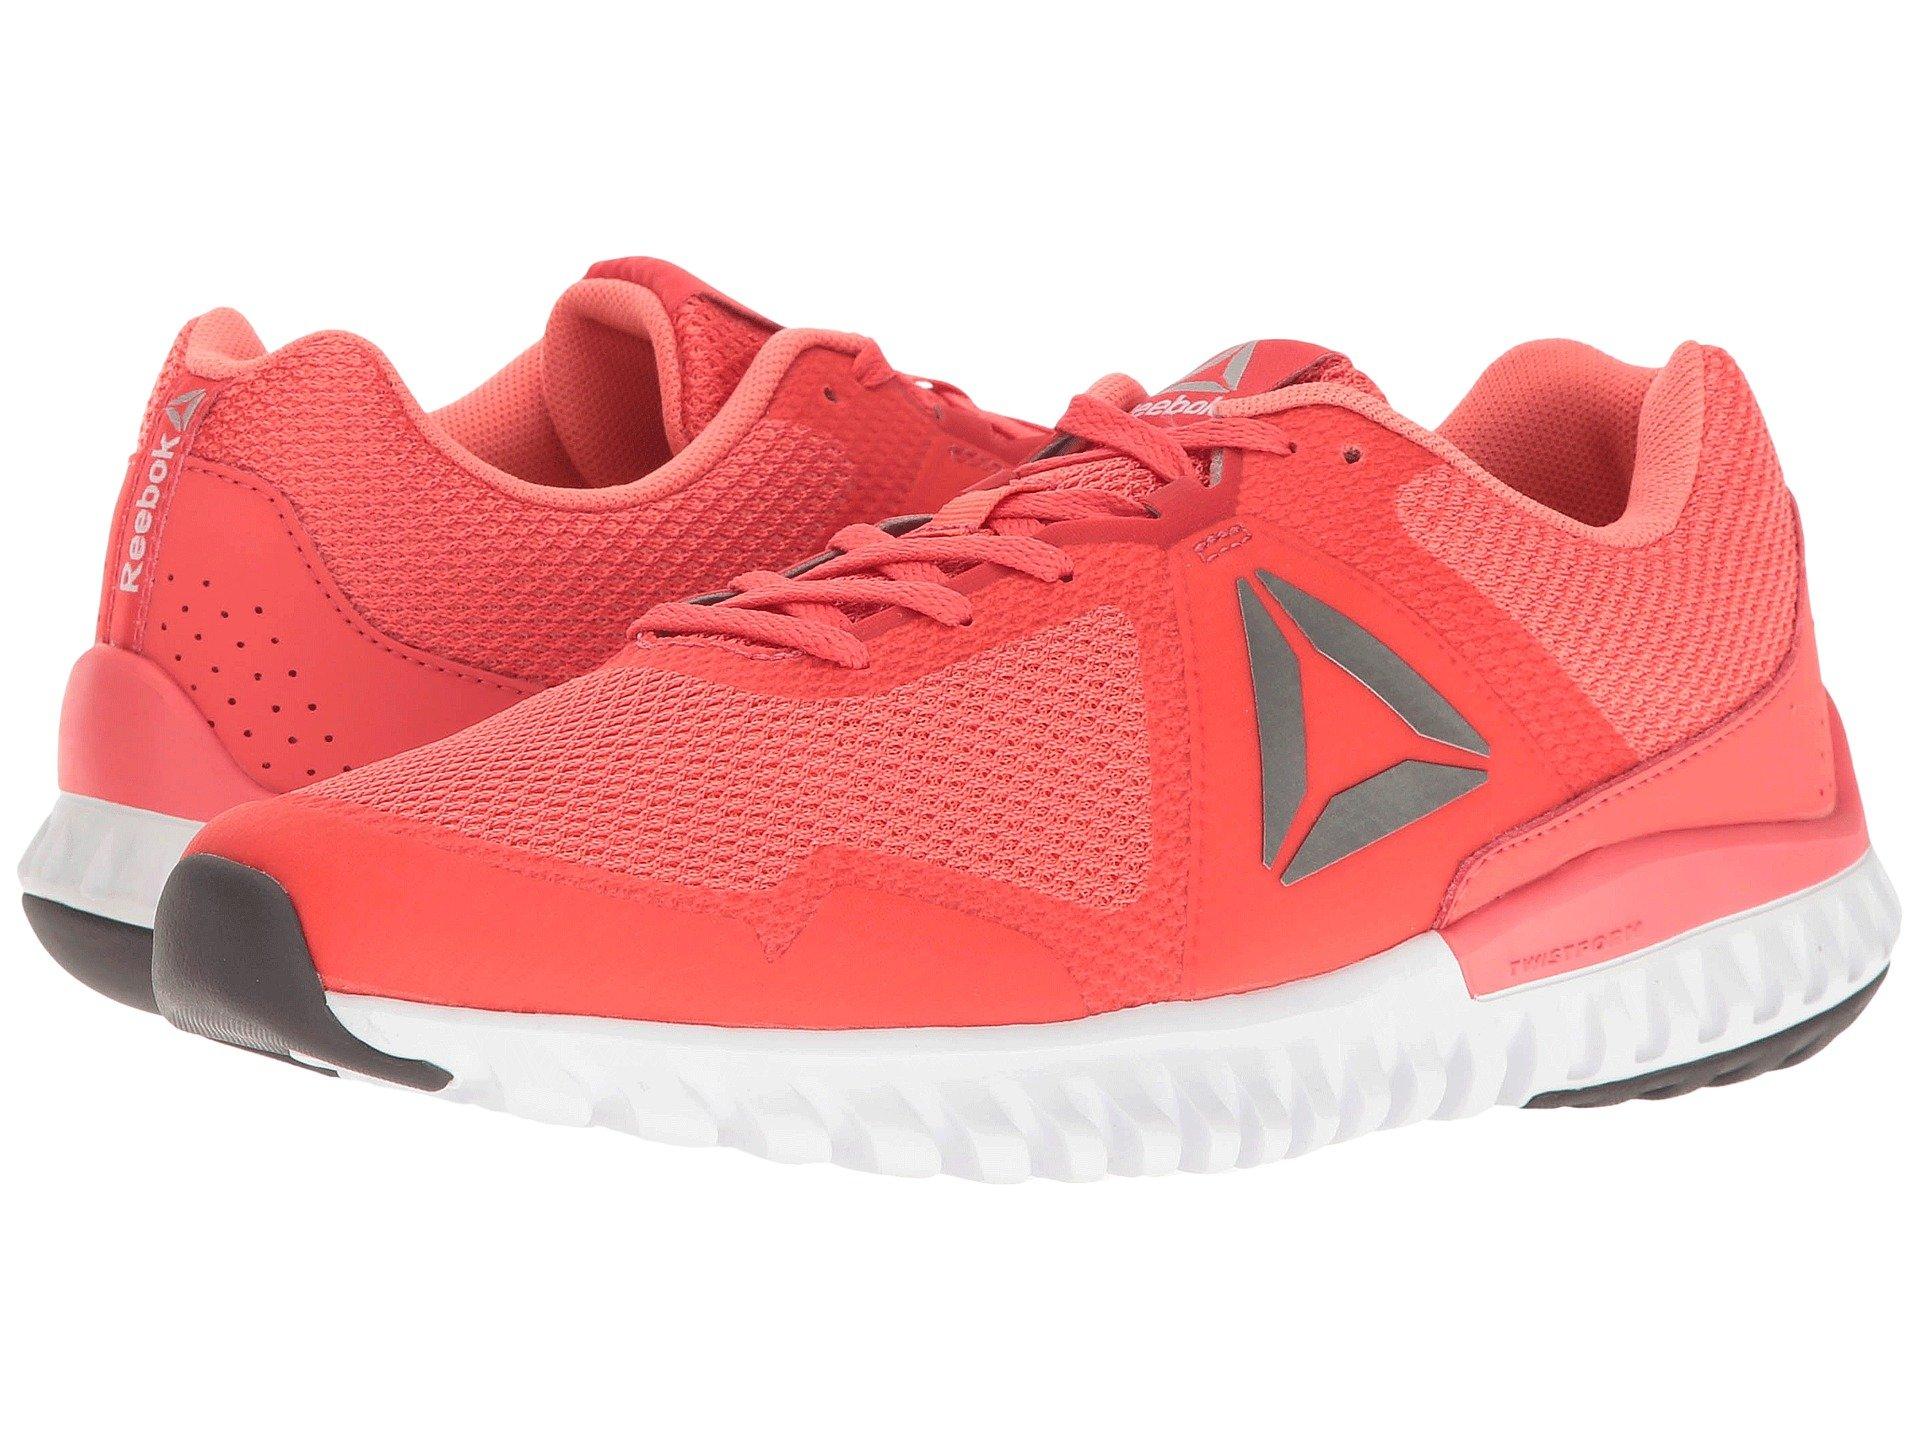 acfaf63a732 Reebok Twistform Blaze 3.0 Mtm In Fire Coral Stellar Pink White Ash Grey